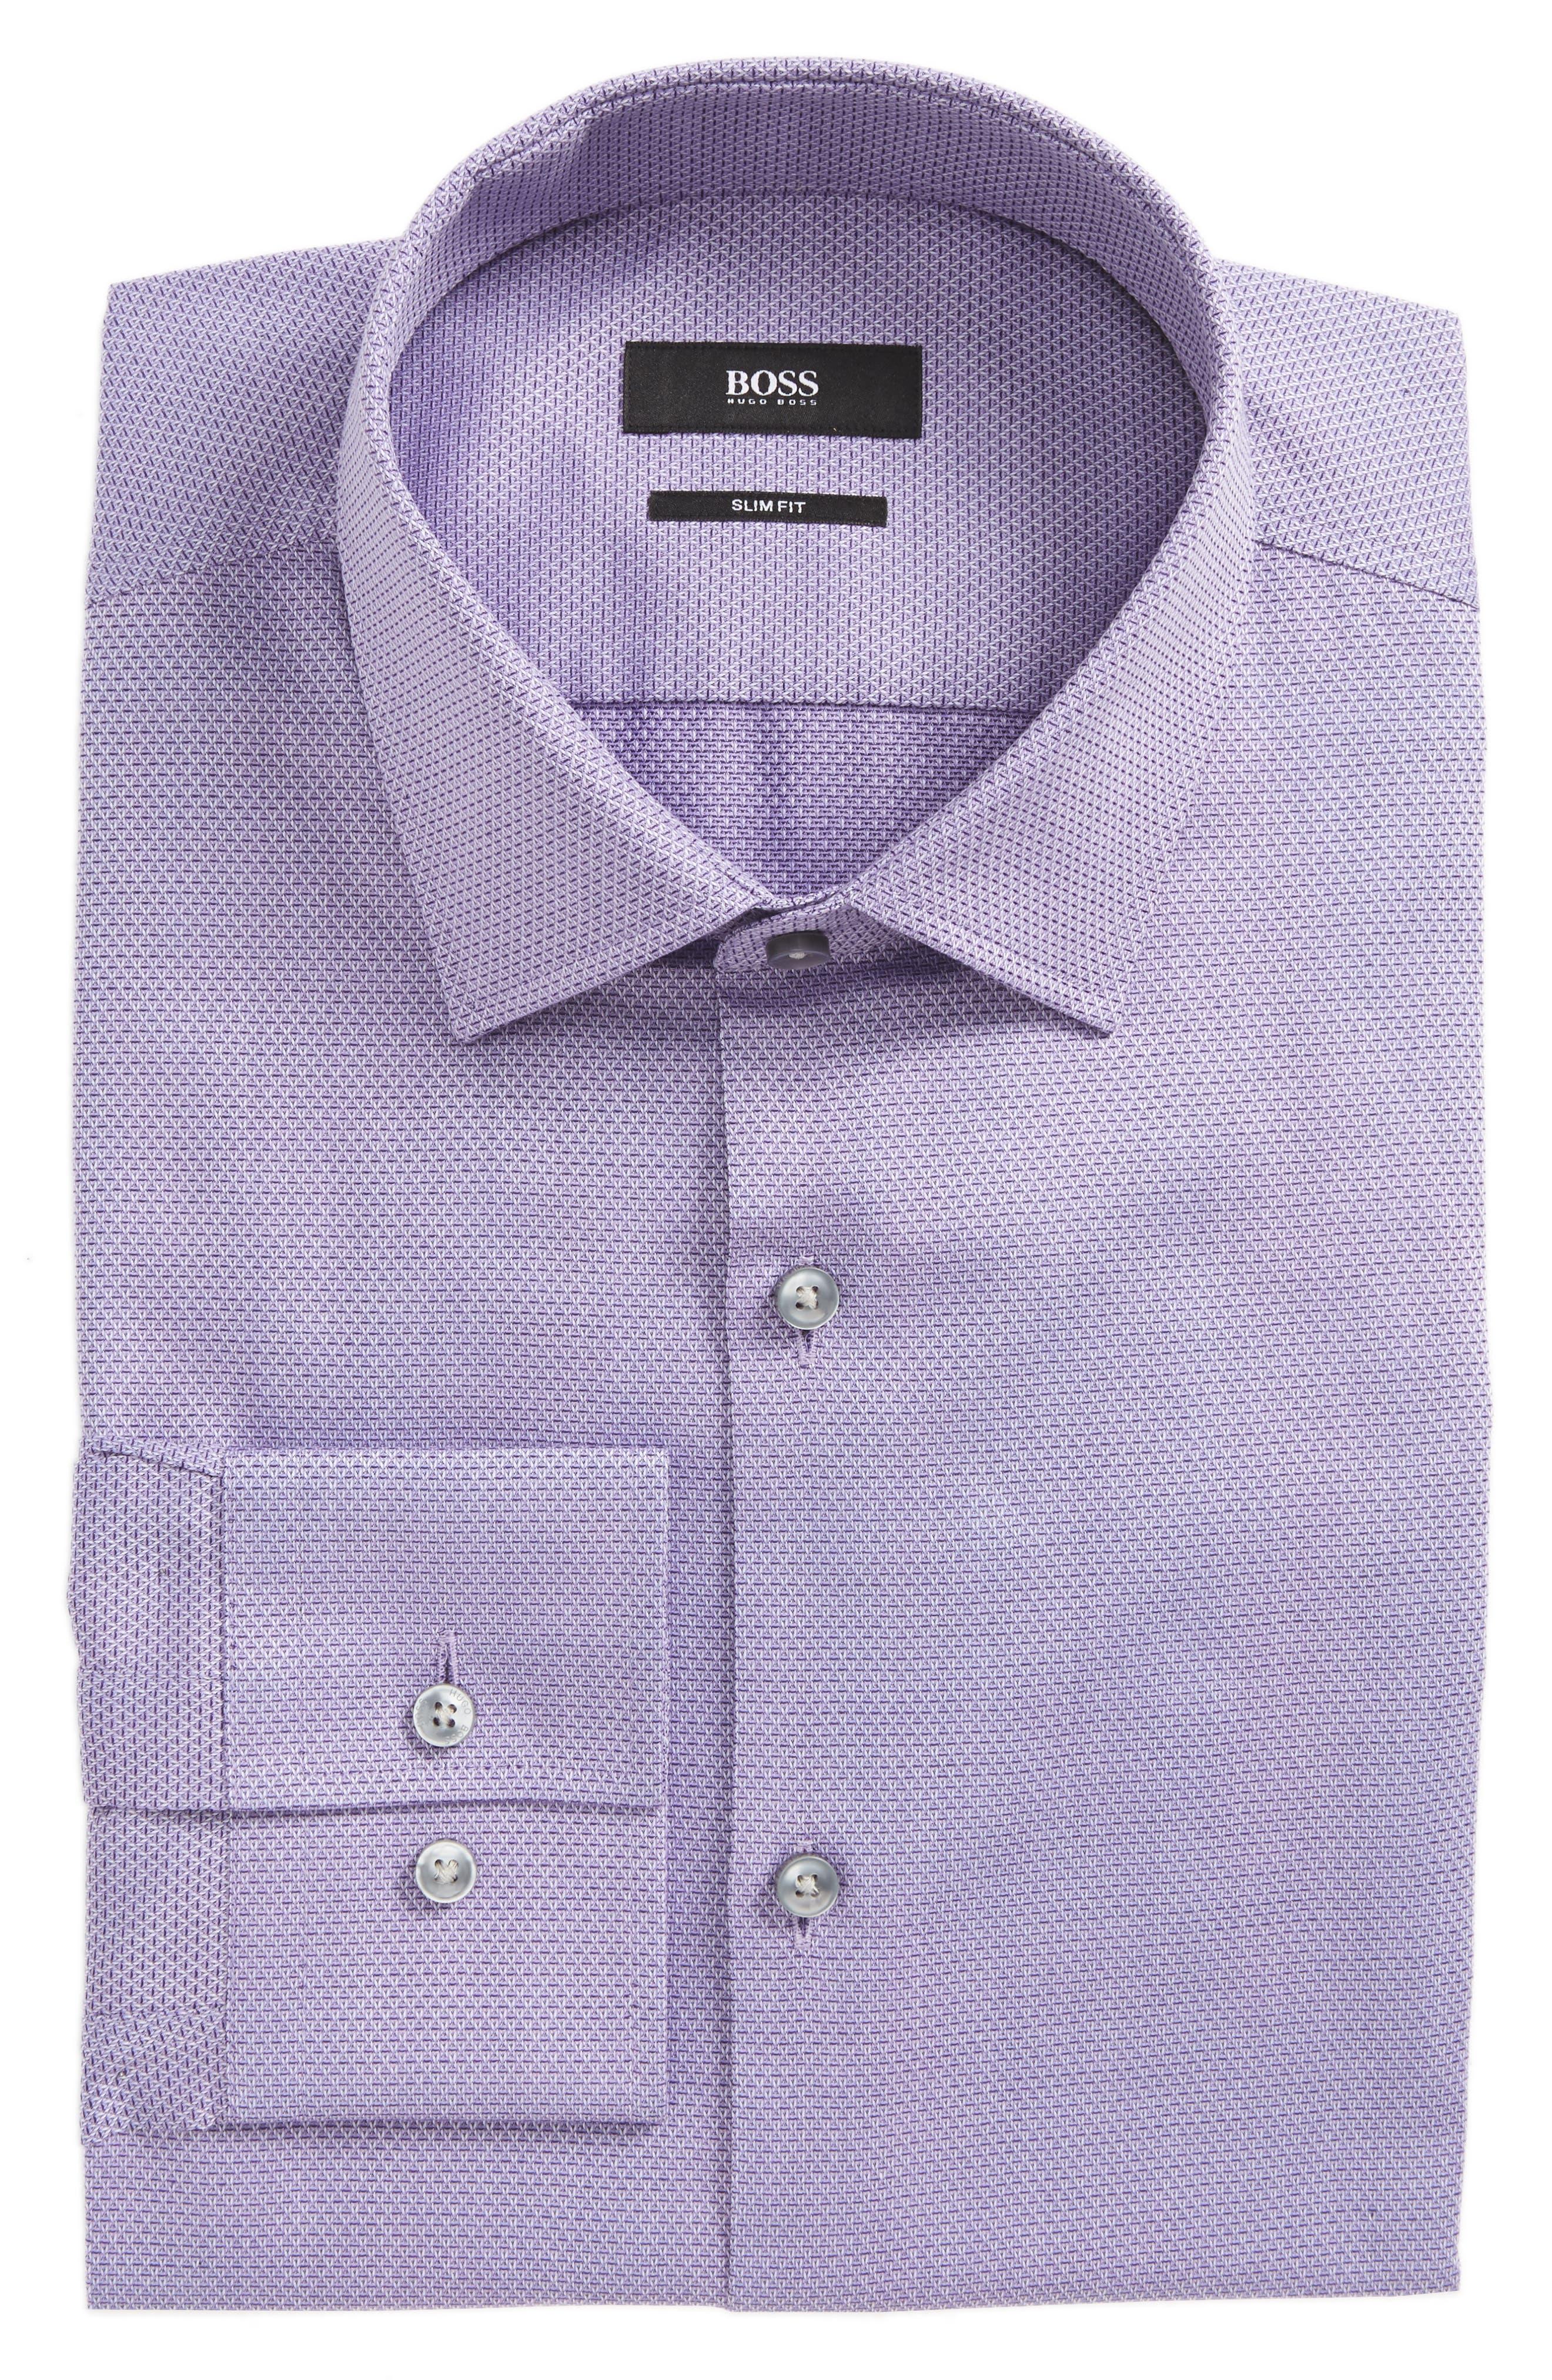 Jenno Slim Fit Textured Dress Shirt,                             Main thumbnail 2, color,